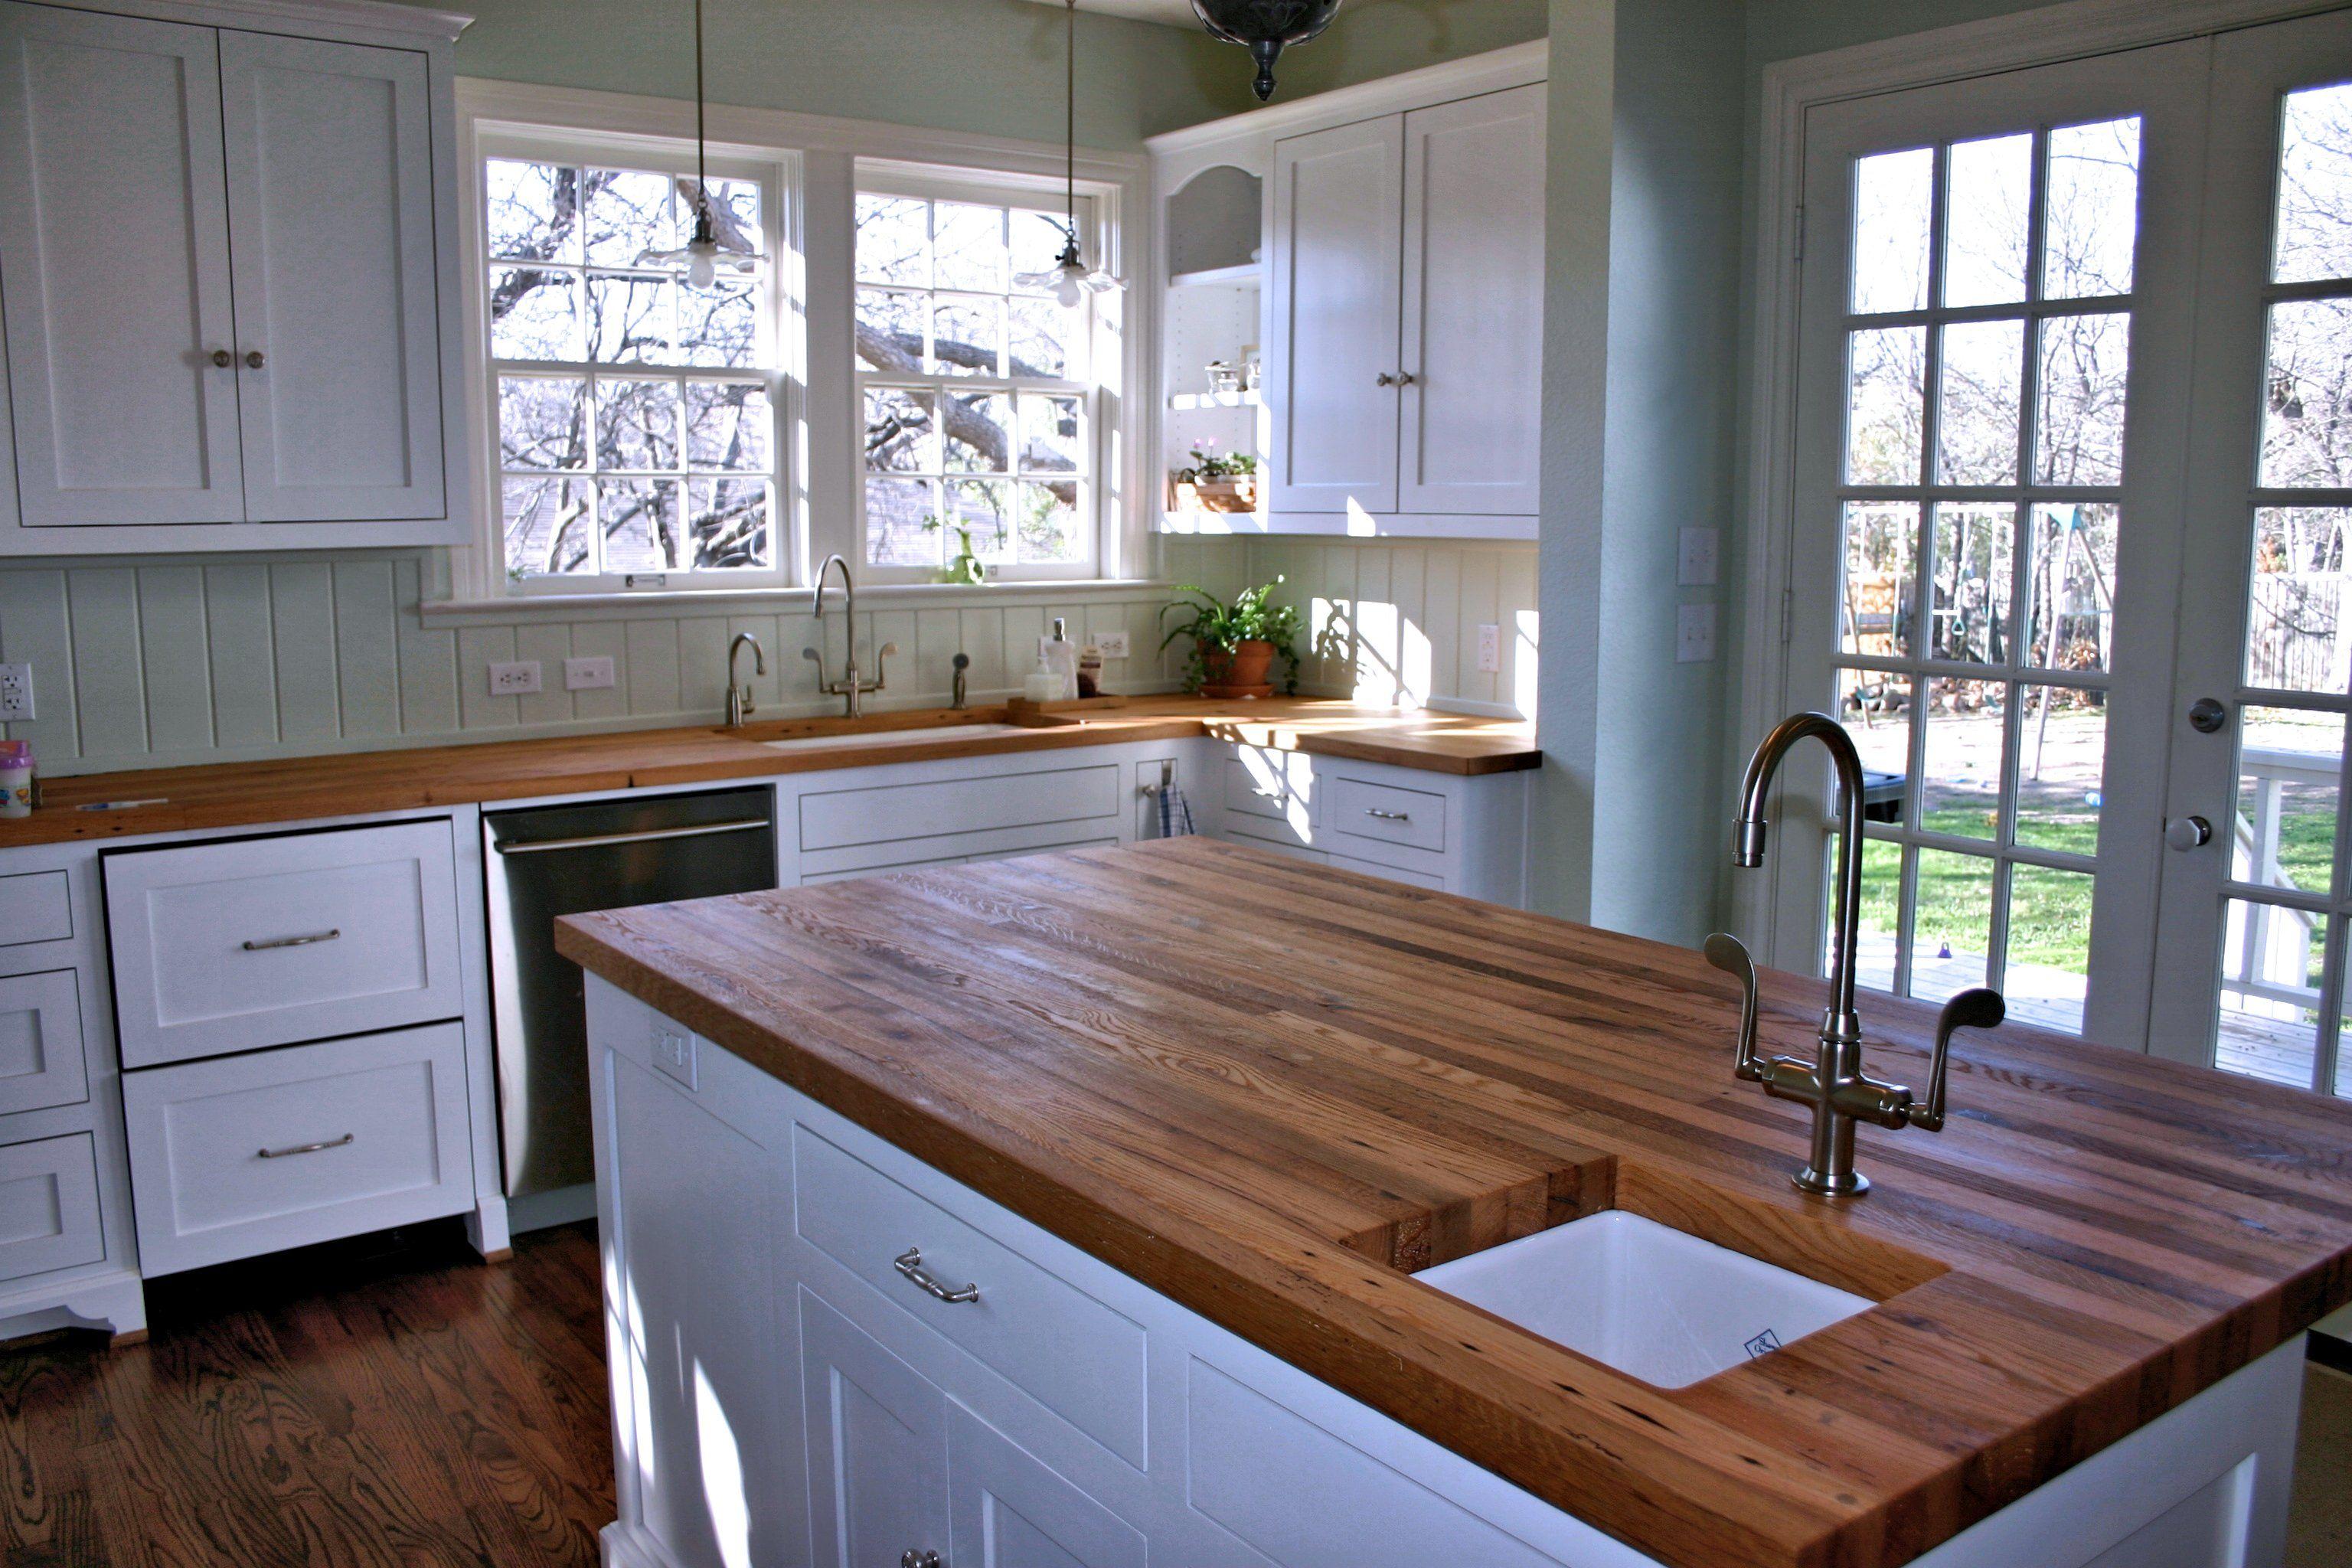 White Kitchen Cabinets With Wood Countertops Nagpurepreneurs